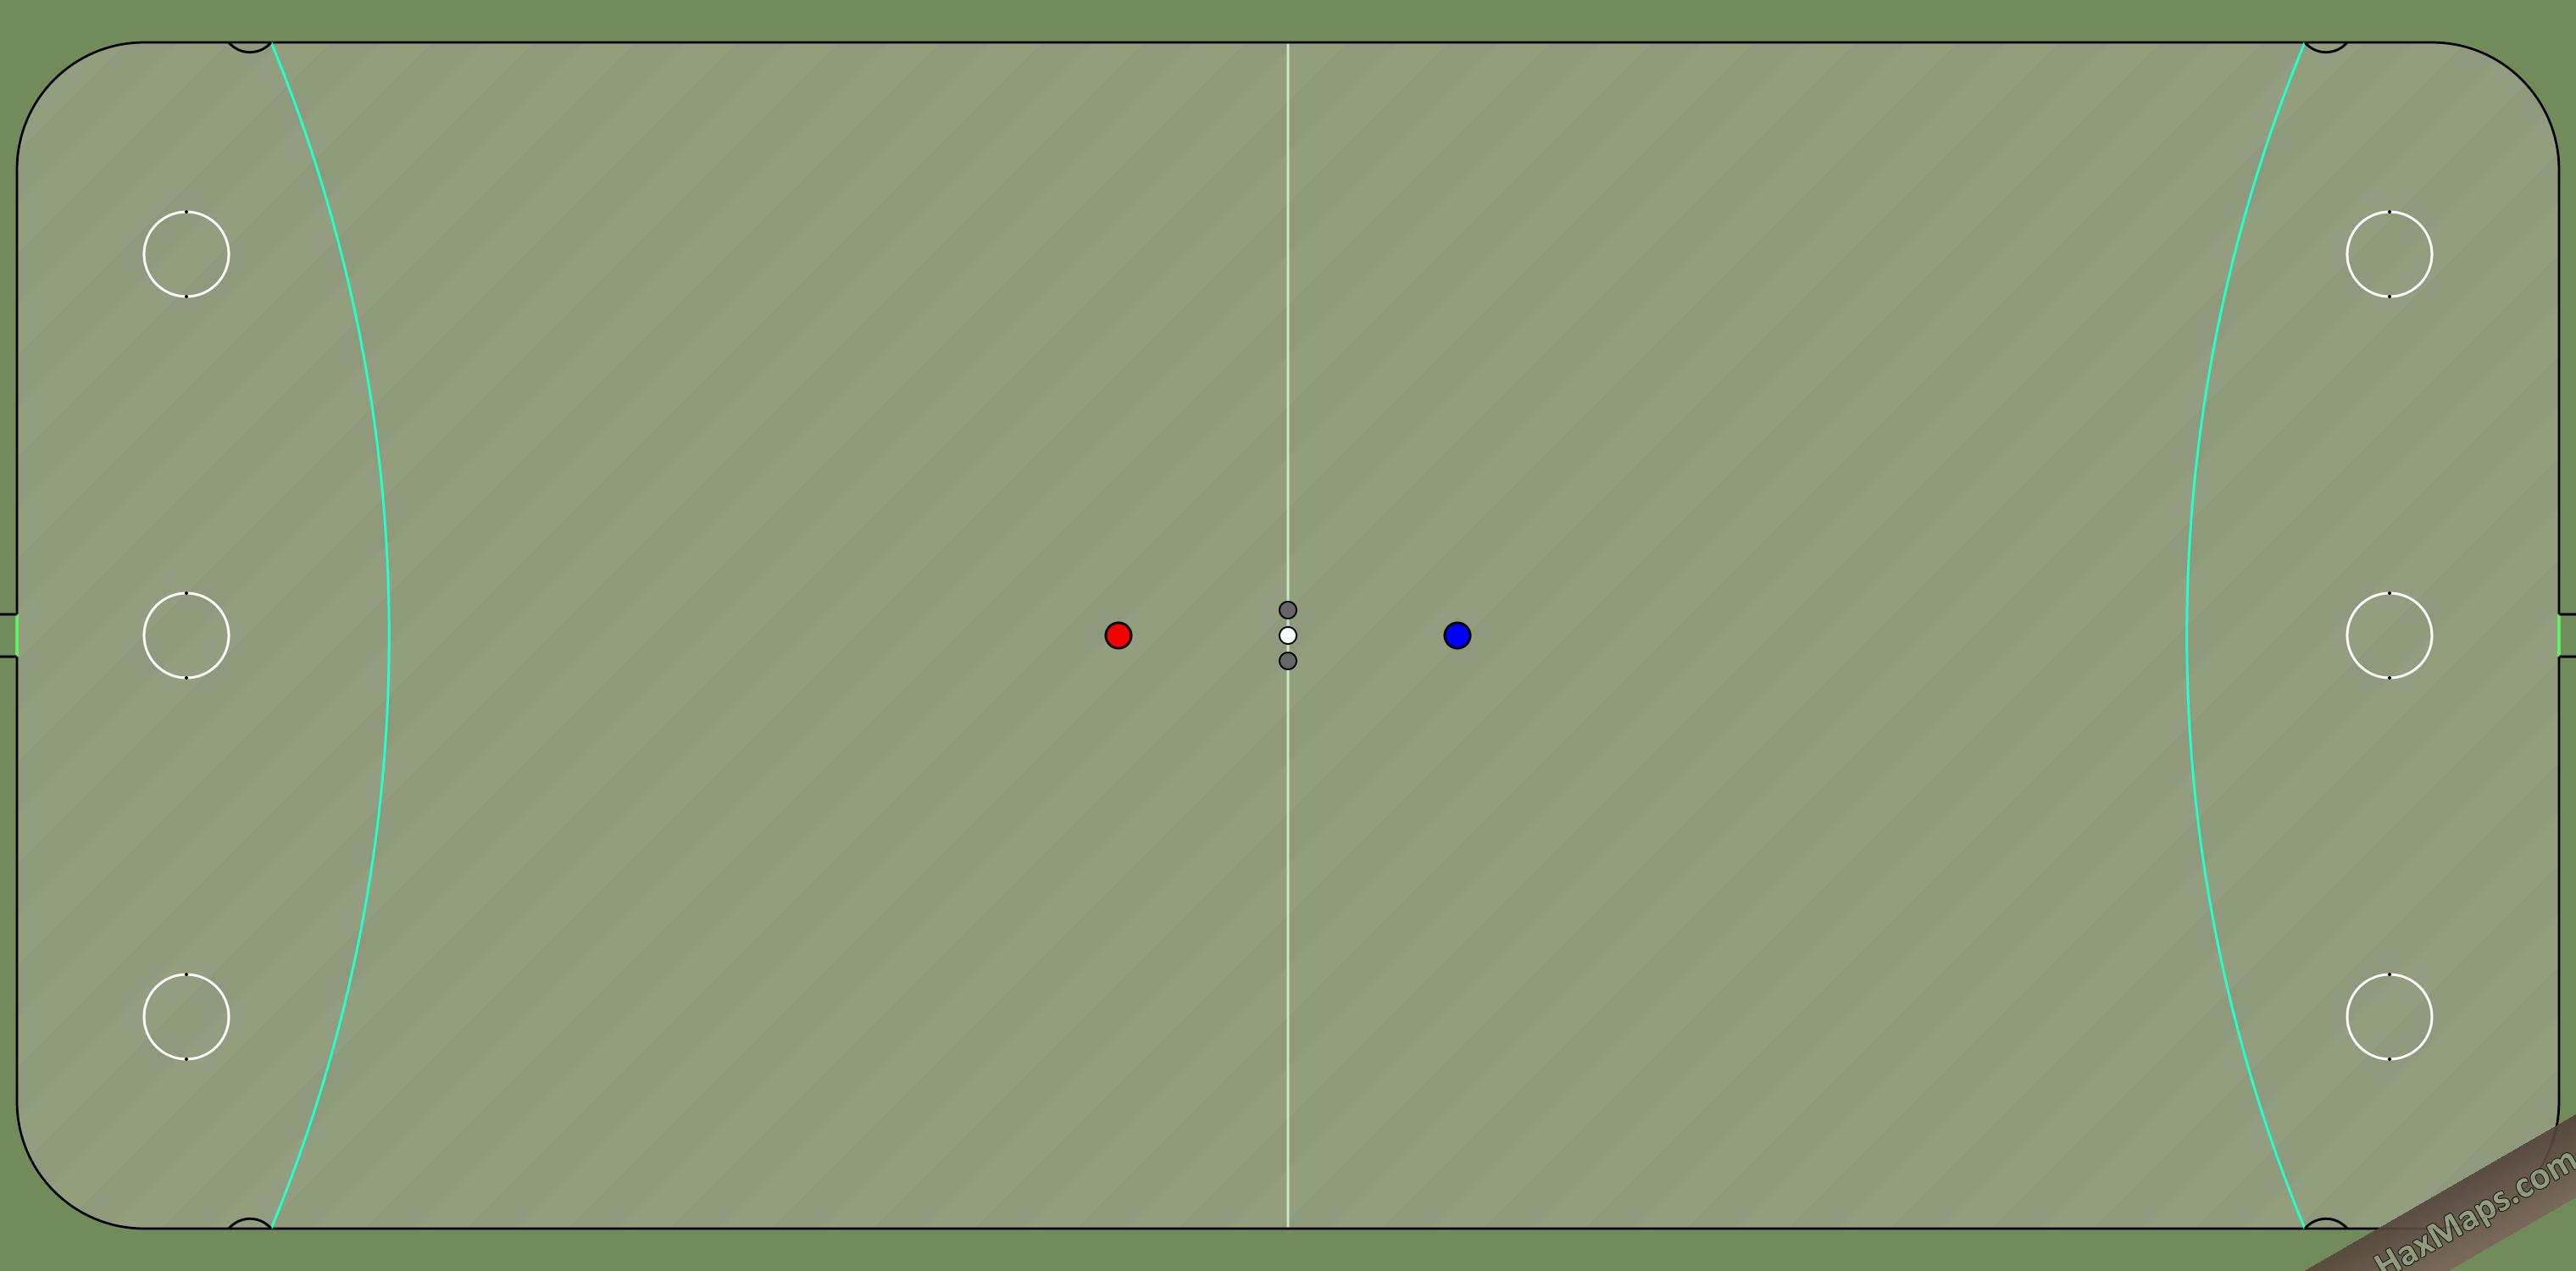 hax ball maps | Quidditch Fast